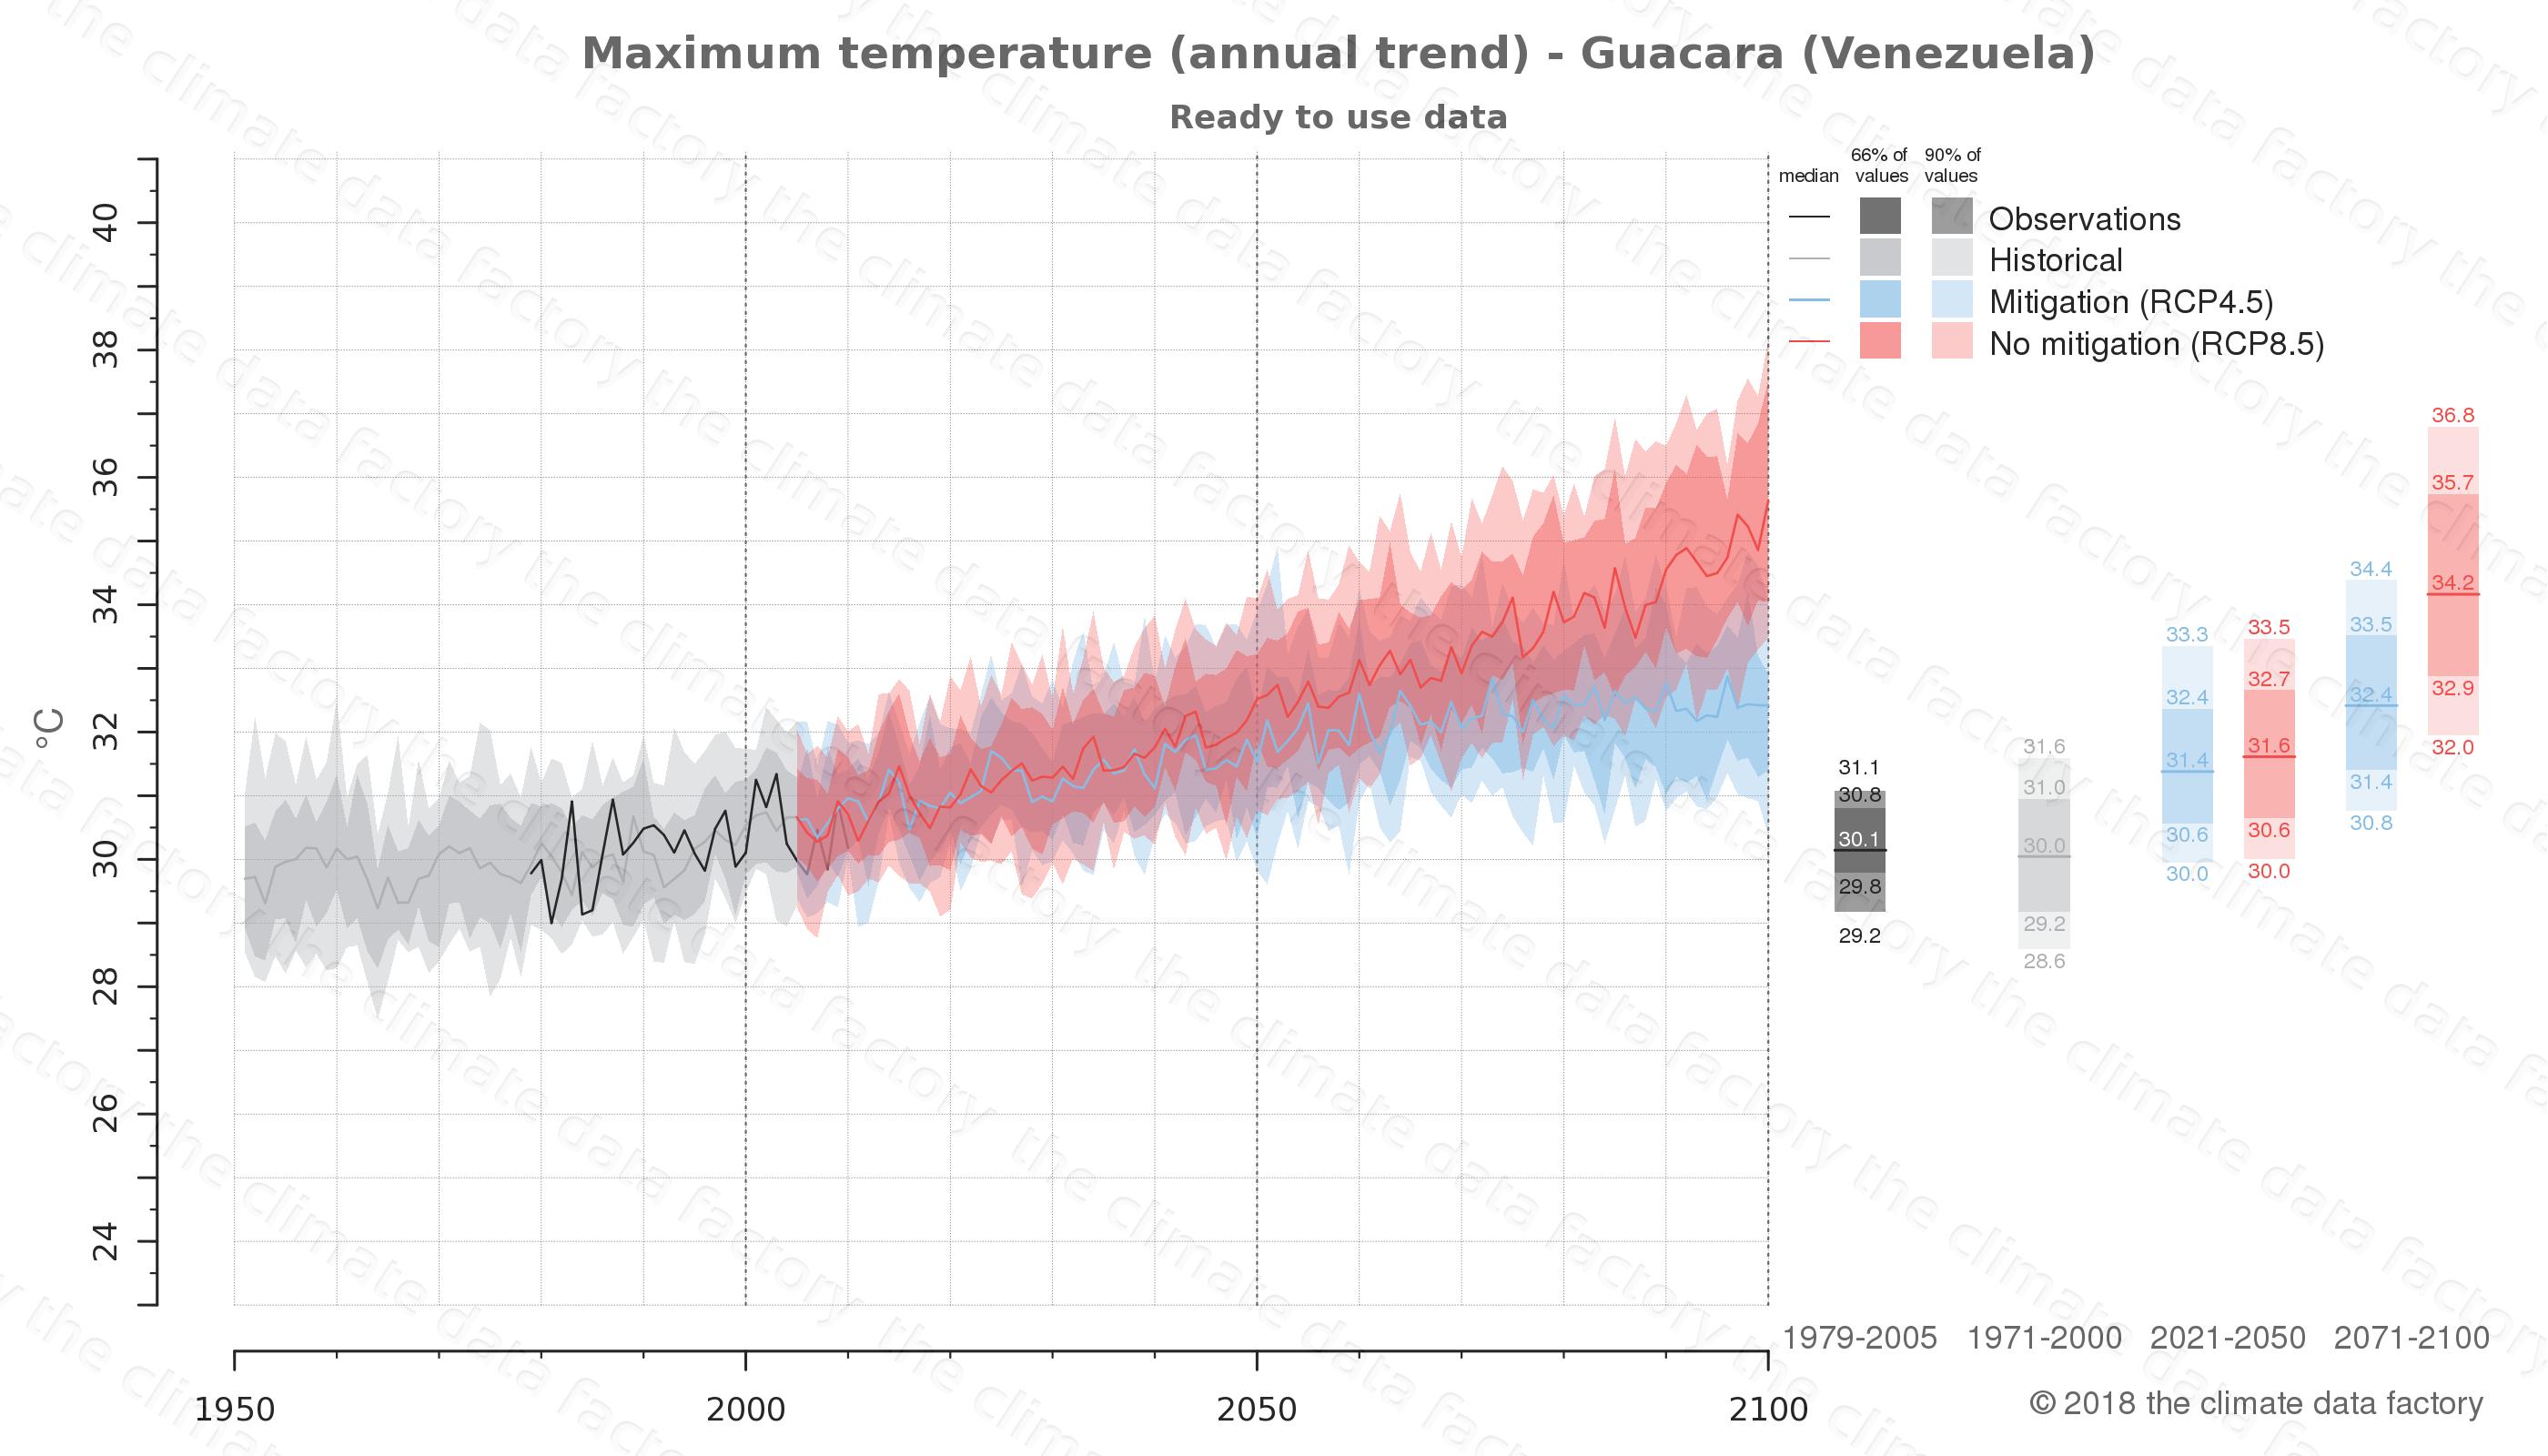 climate change data policy adaptation climate graph city data maximum-temperature guacara venezuela